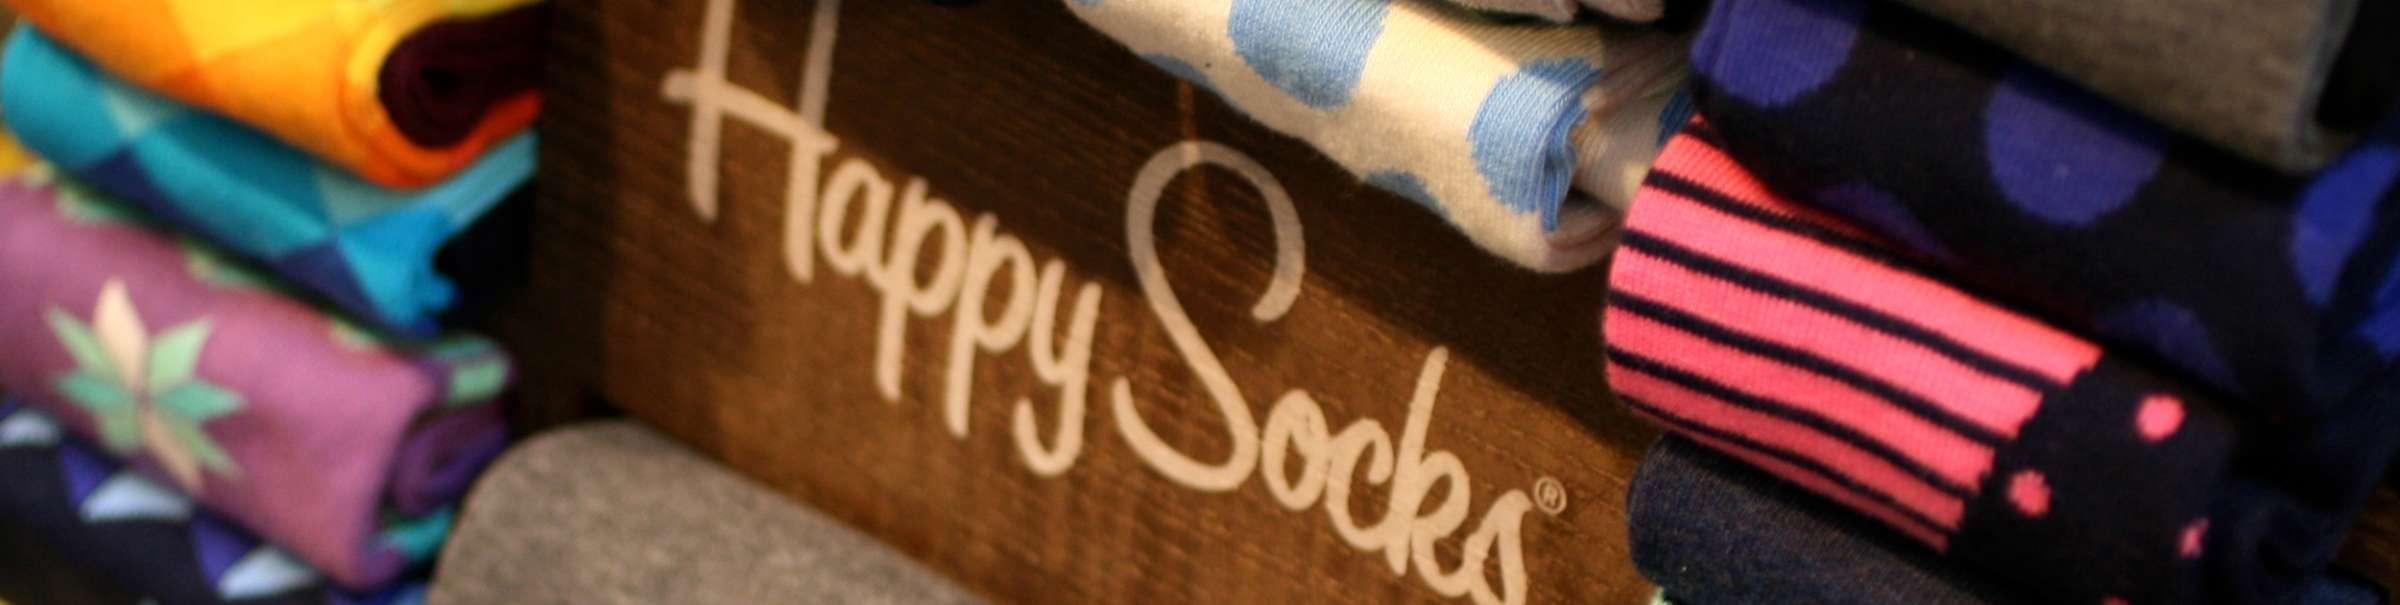 gate8-happy-socks-box-b9c522097c9a49ab0662f06b0be671a0